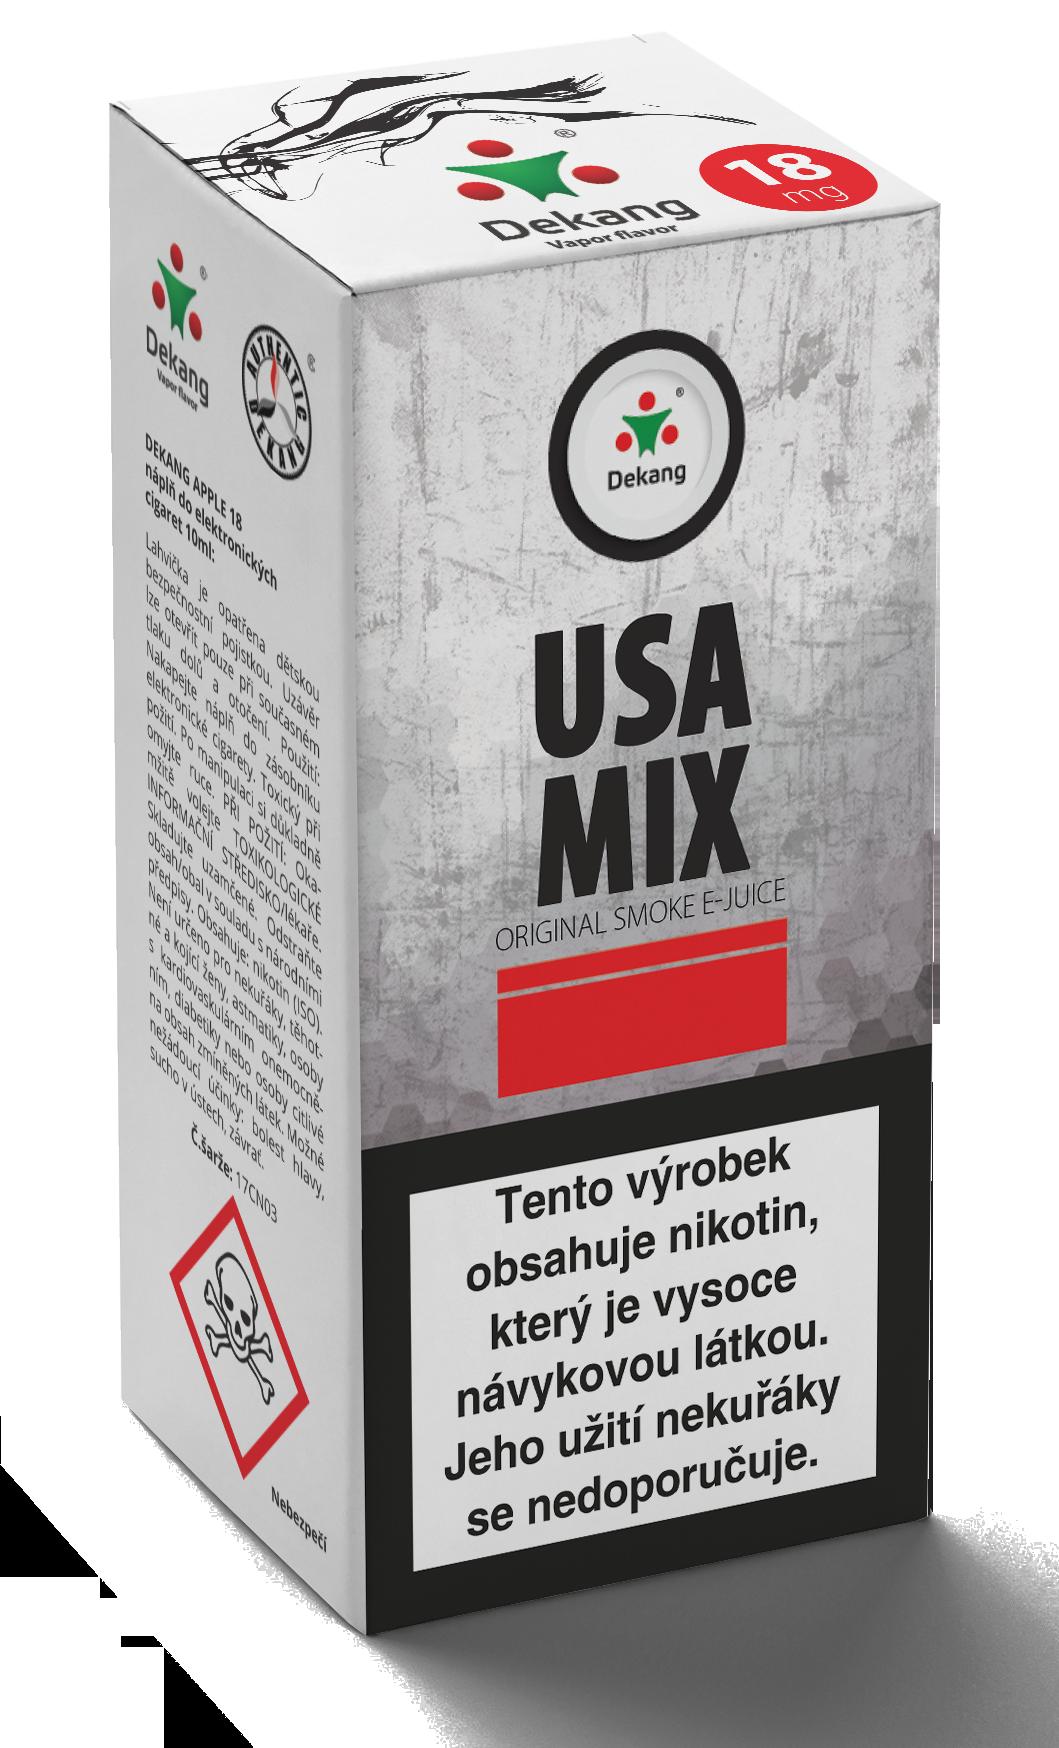 E-liquid Dekang 10ml USA MIX Množství nikotinu: 18mg